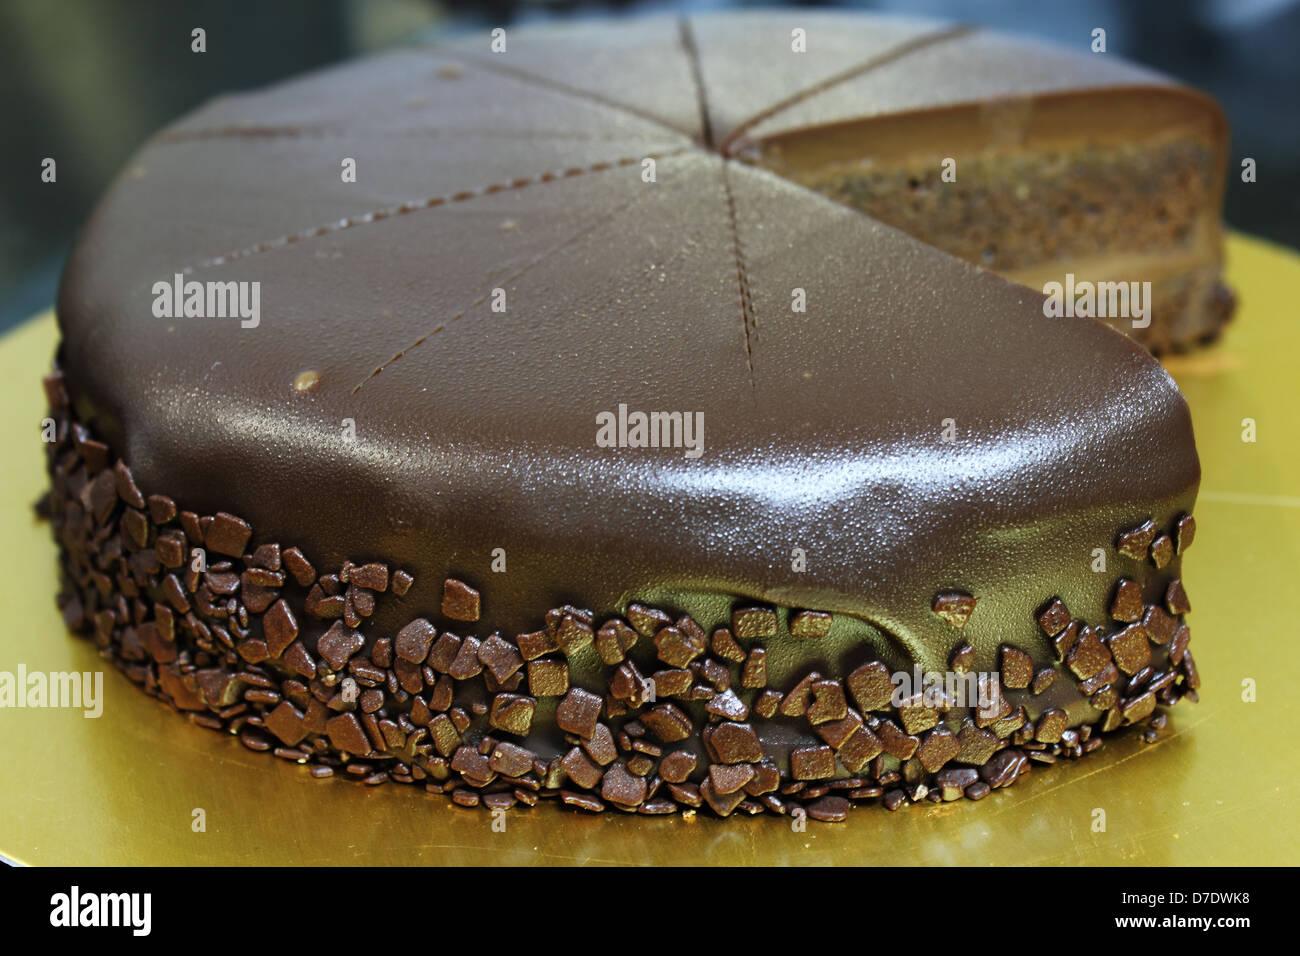 Chocolate Shavings Cake Decorations